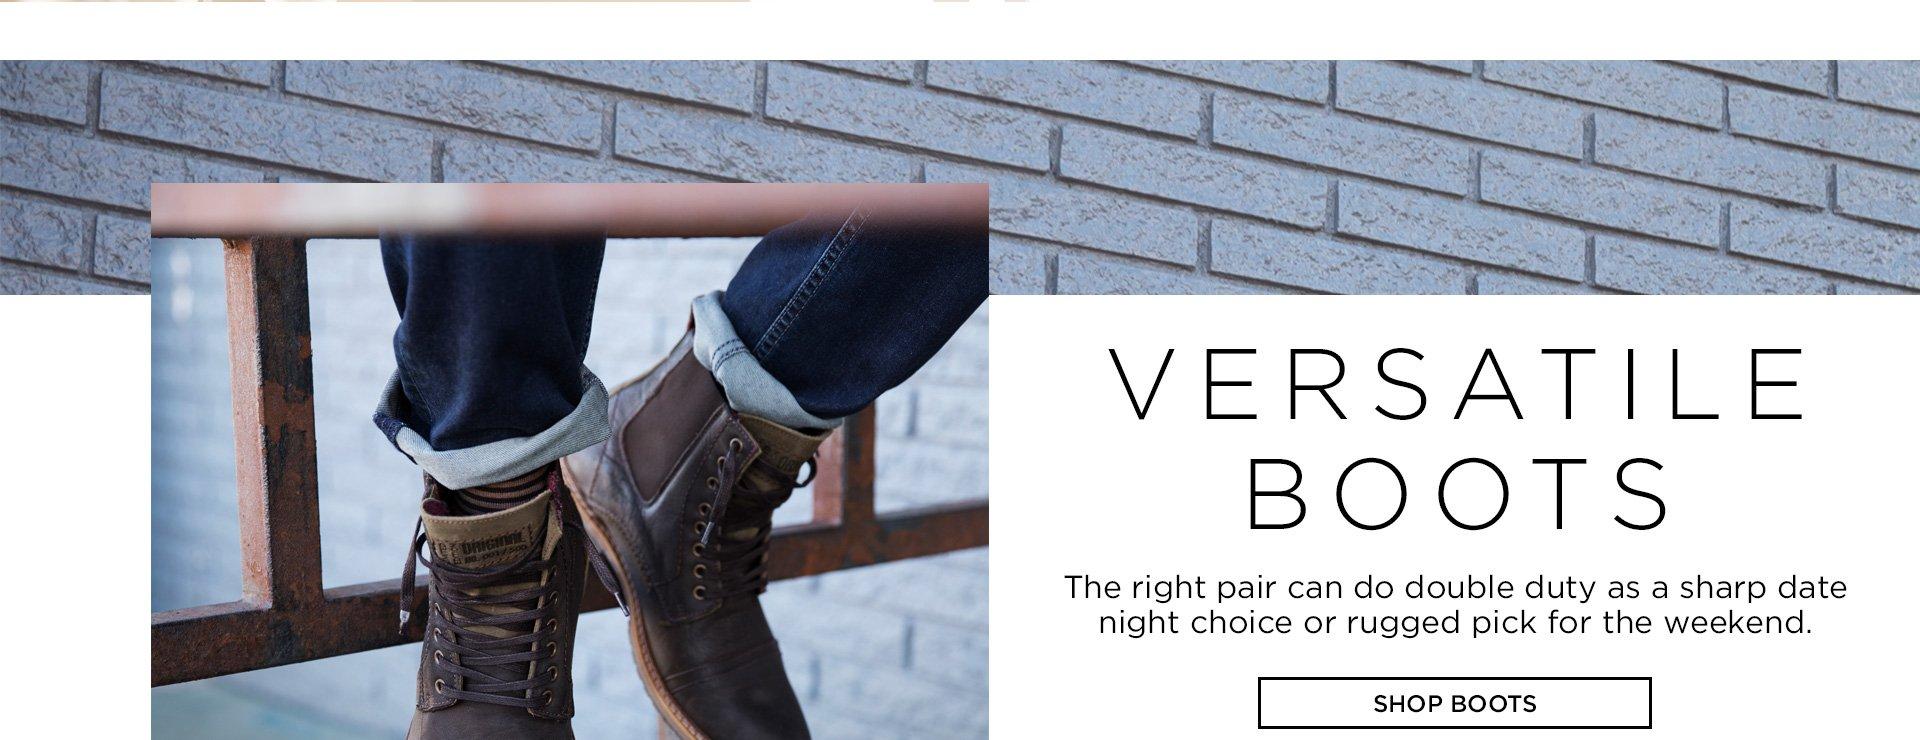 Versatile Boots